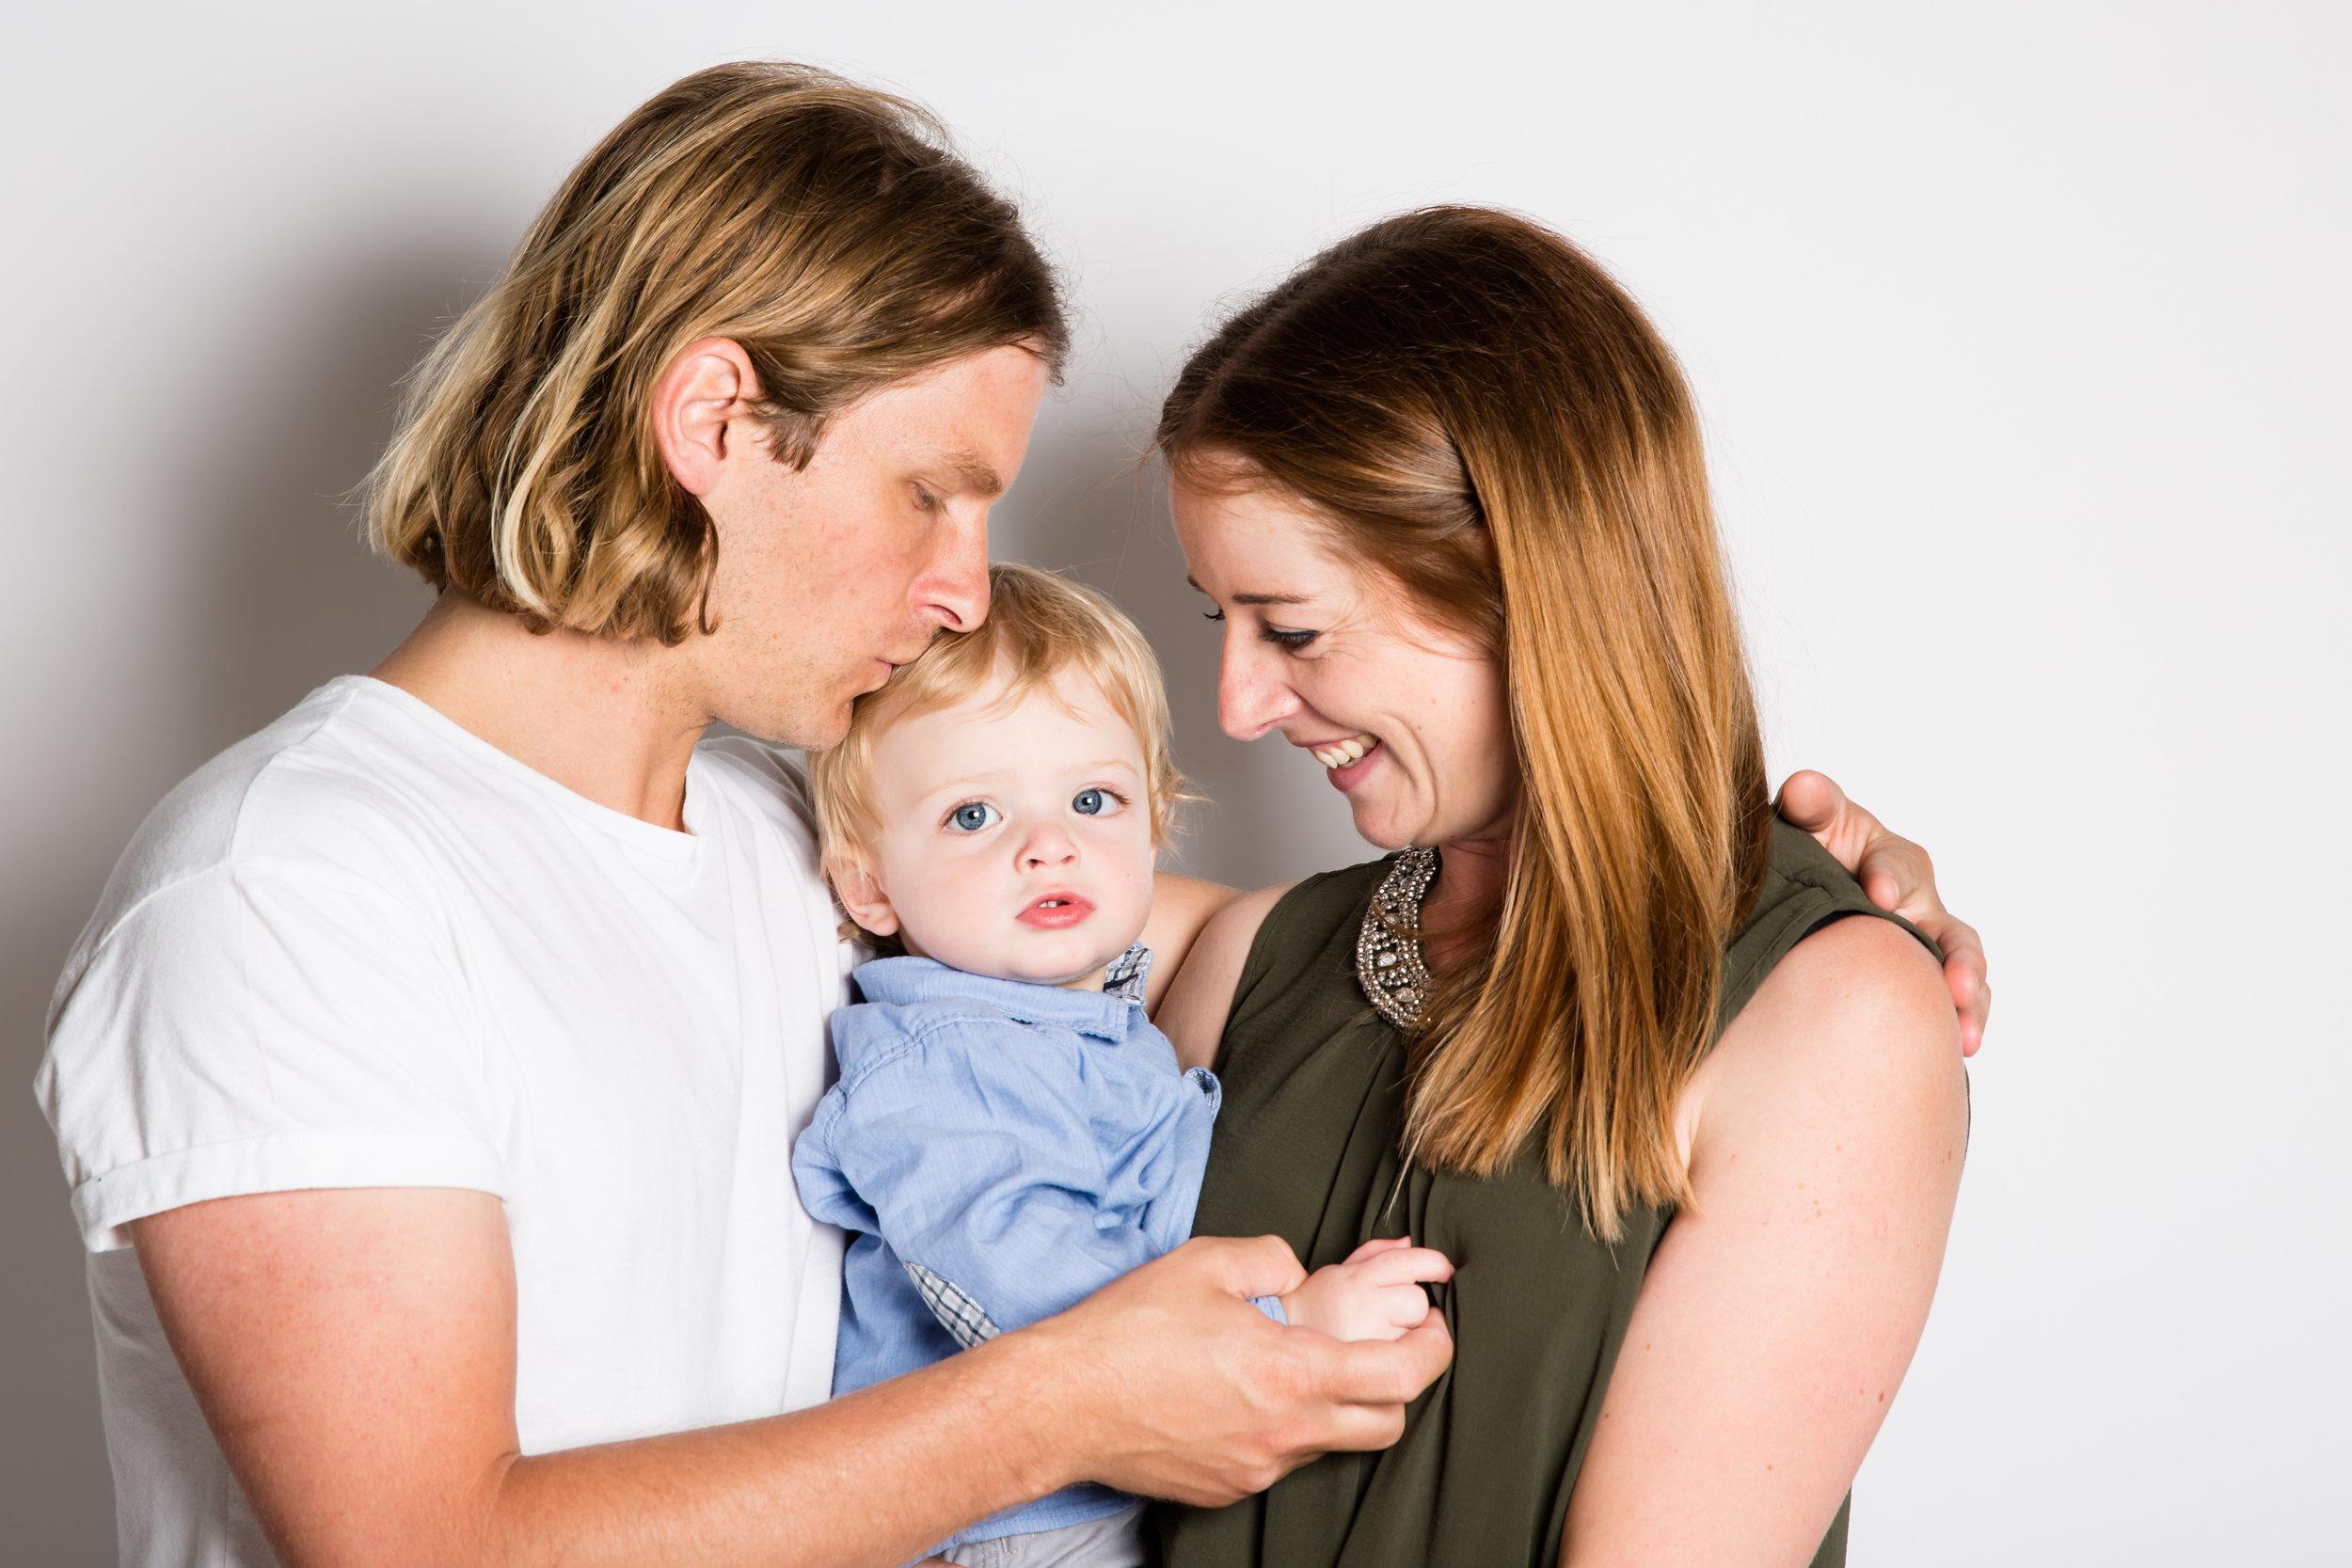 FAMILY-PORTRAIT-BABY-PHOTO-STUDIO-3L4A8142.jpg